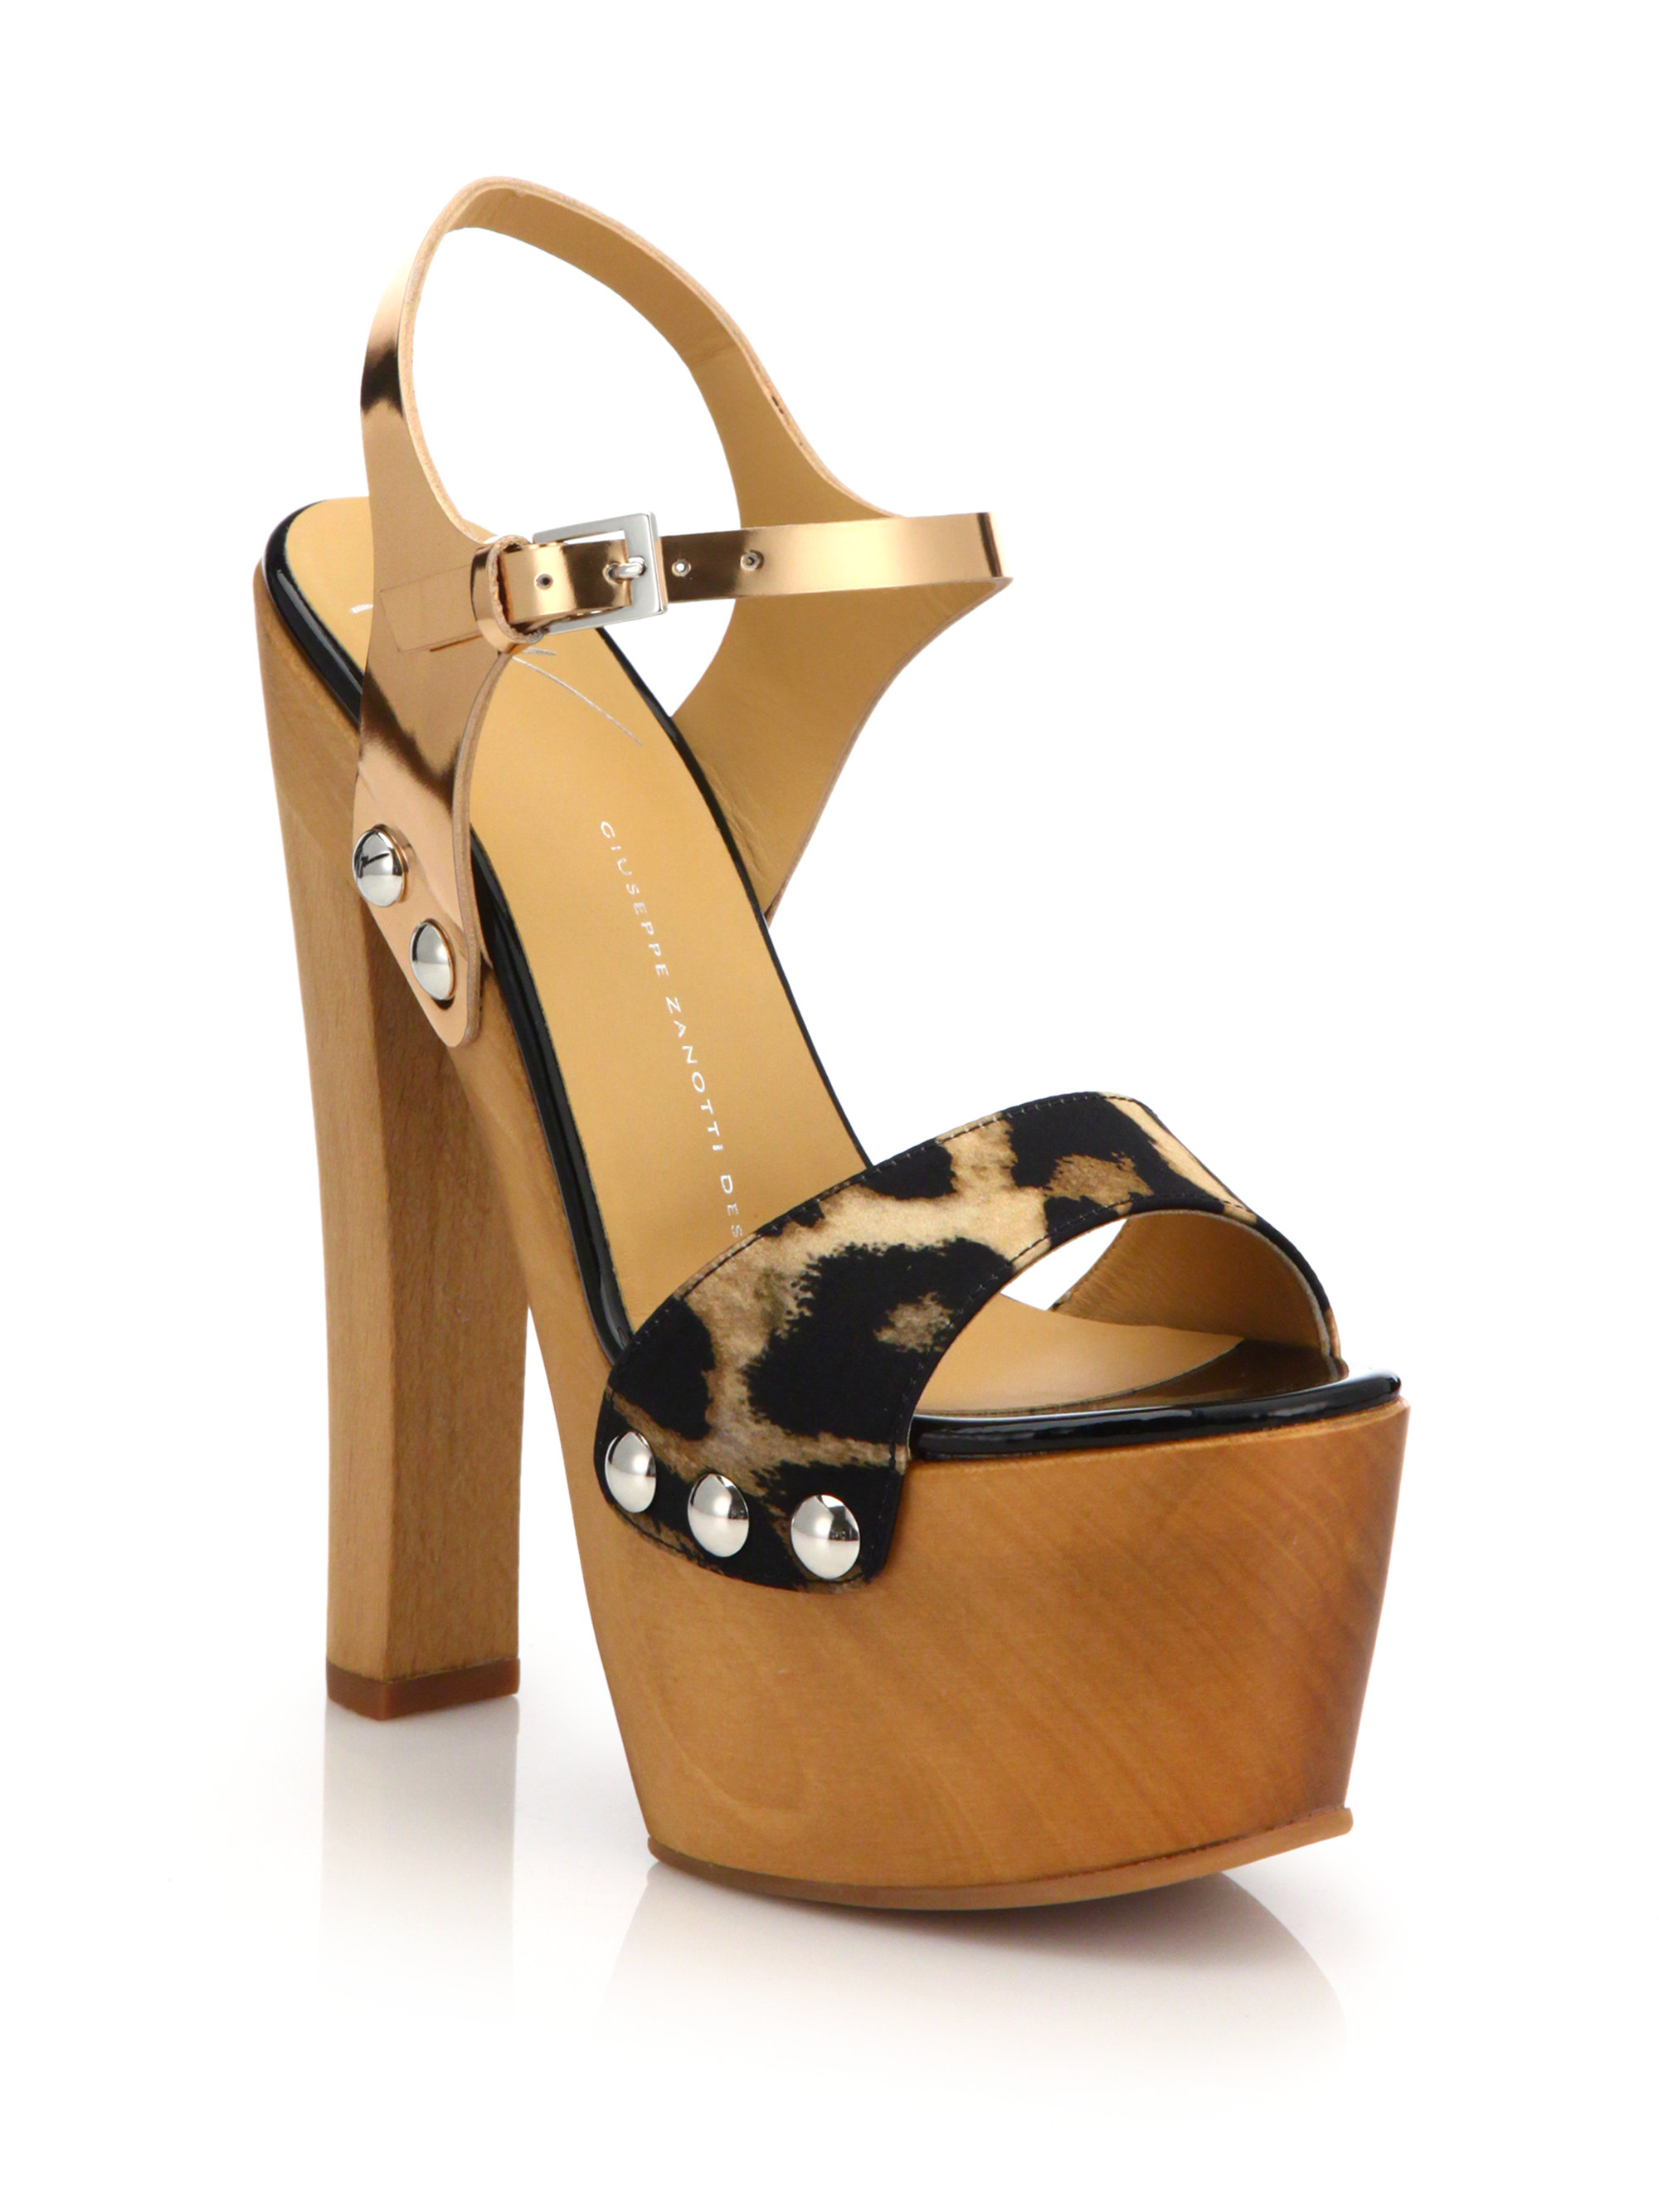 d5fb8306fa9e Lyst - Giuseppe Zanotti Wooden Clog Platform Sandals